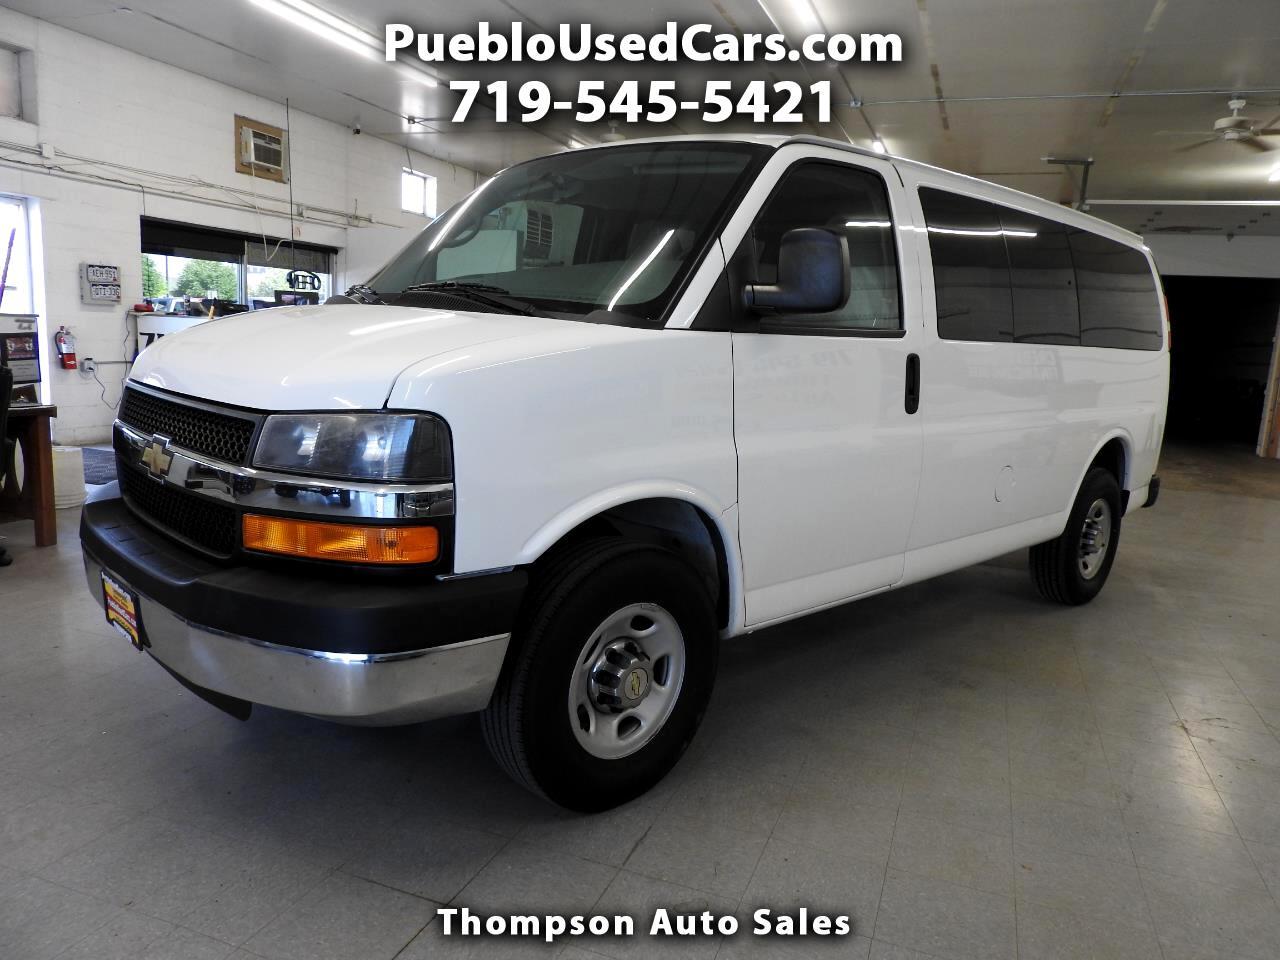 2013 Chevrolet Express LT 3500 12 Passenger